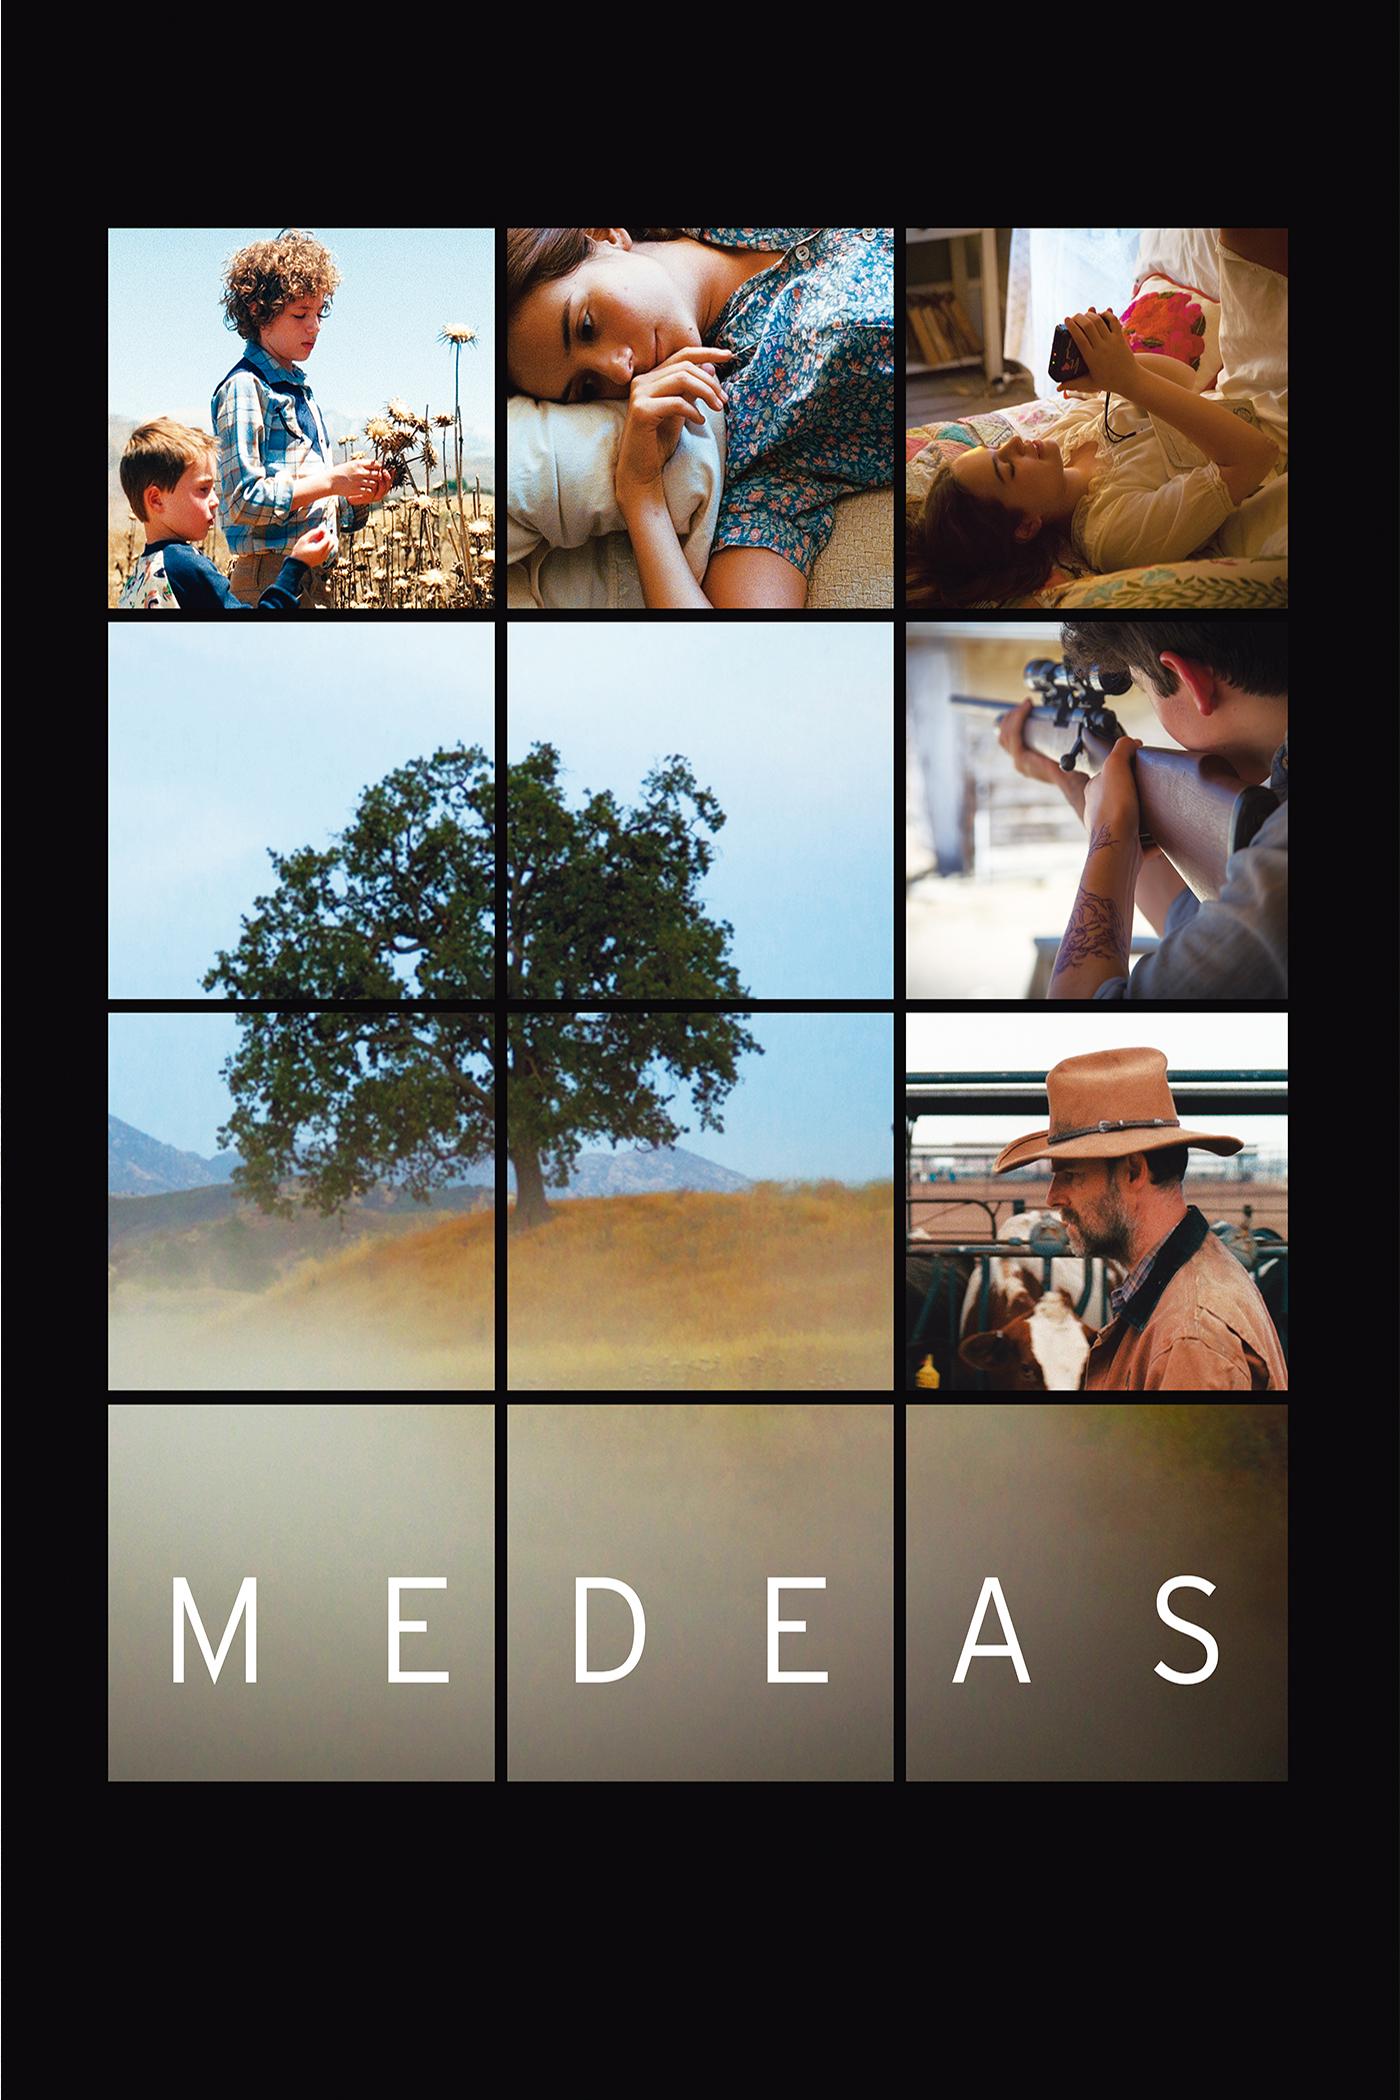 Post Medeas.jpg